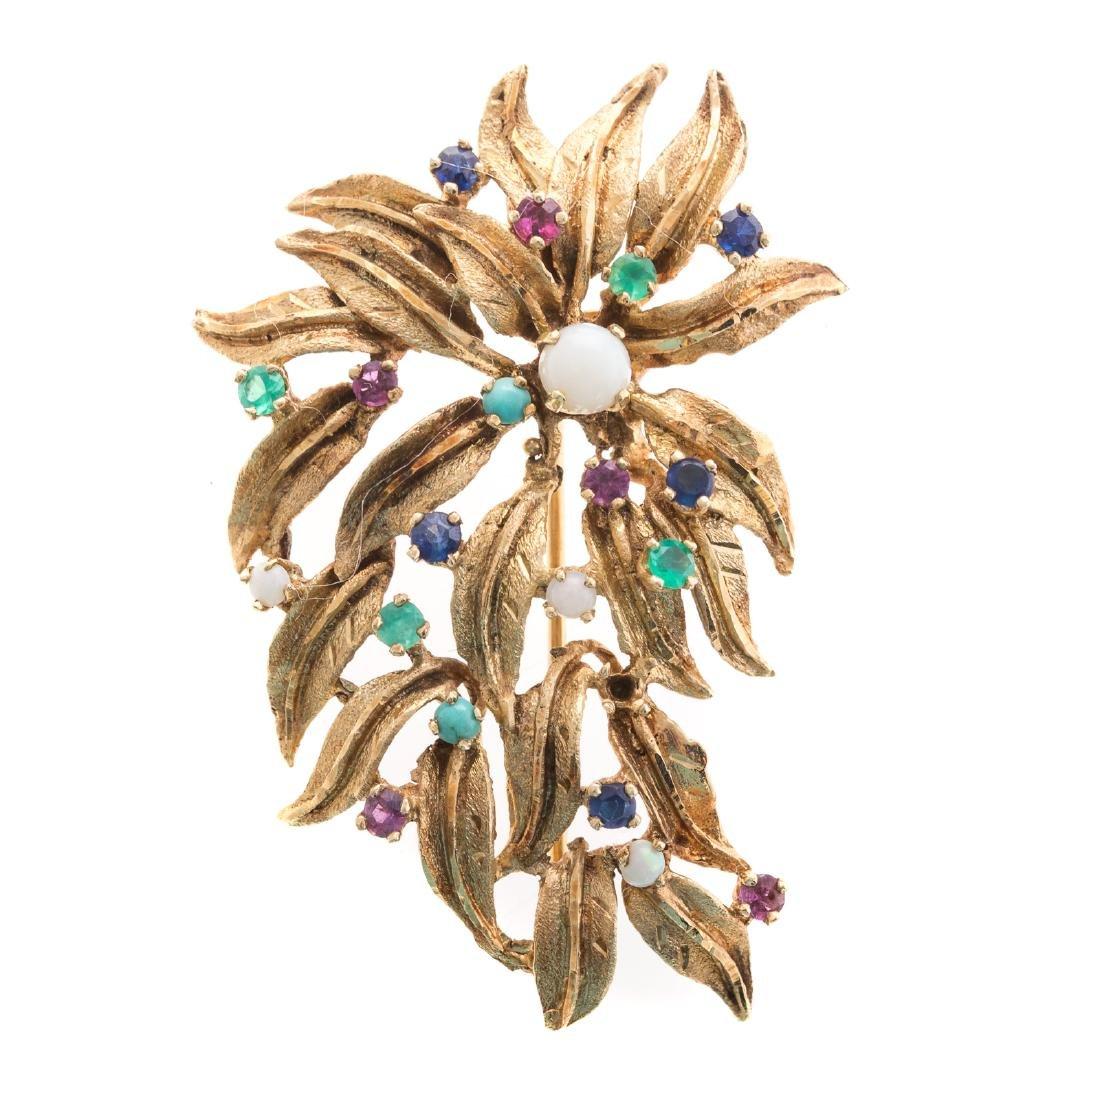 A Lady's Gemstone Brooch in 14K Gold